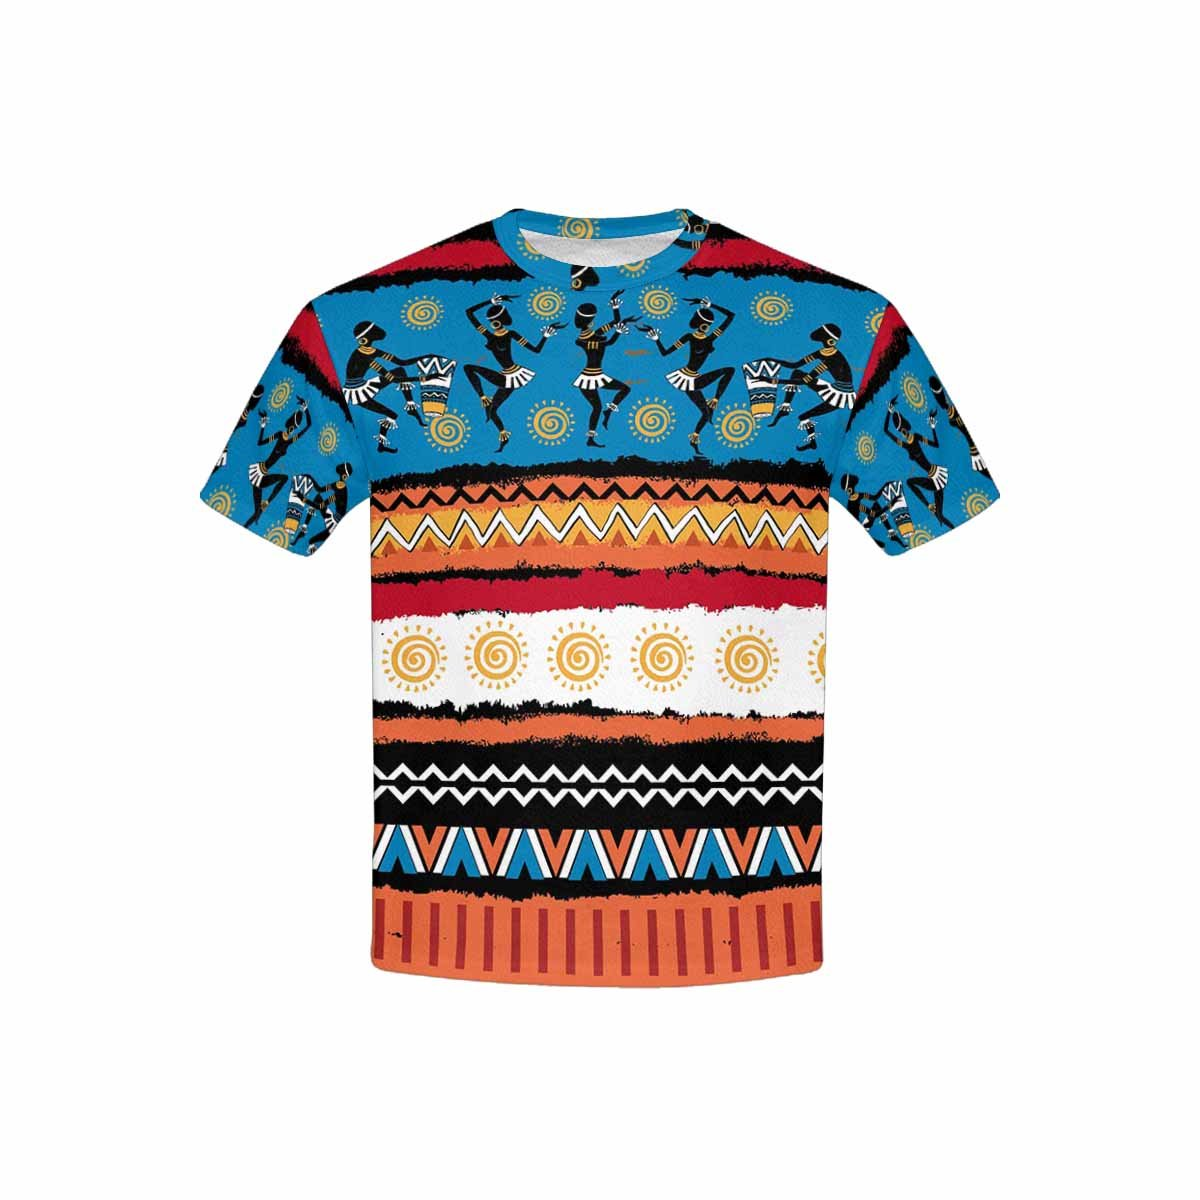 INTERESTPRINT Childs T-Shirt Ethnic Ornament Set XS-XL